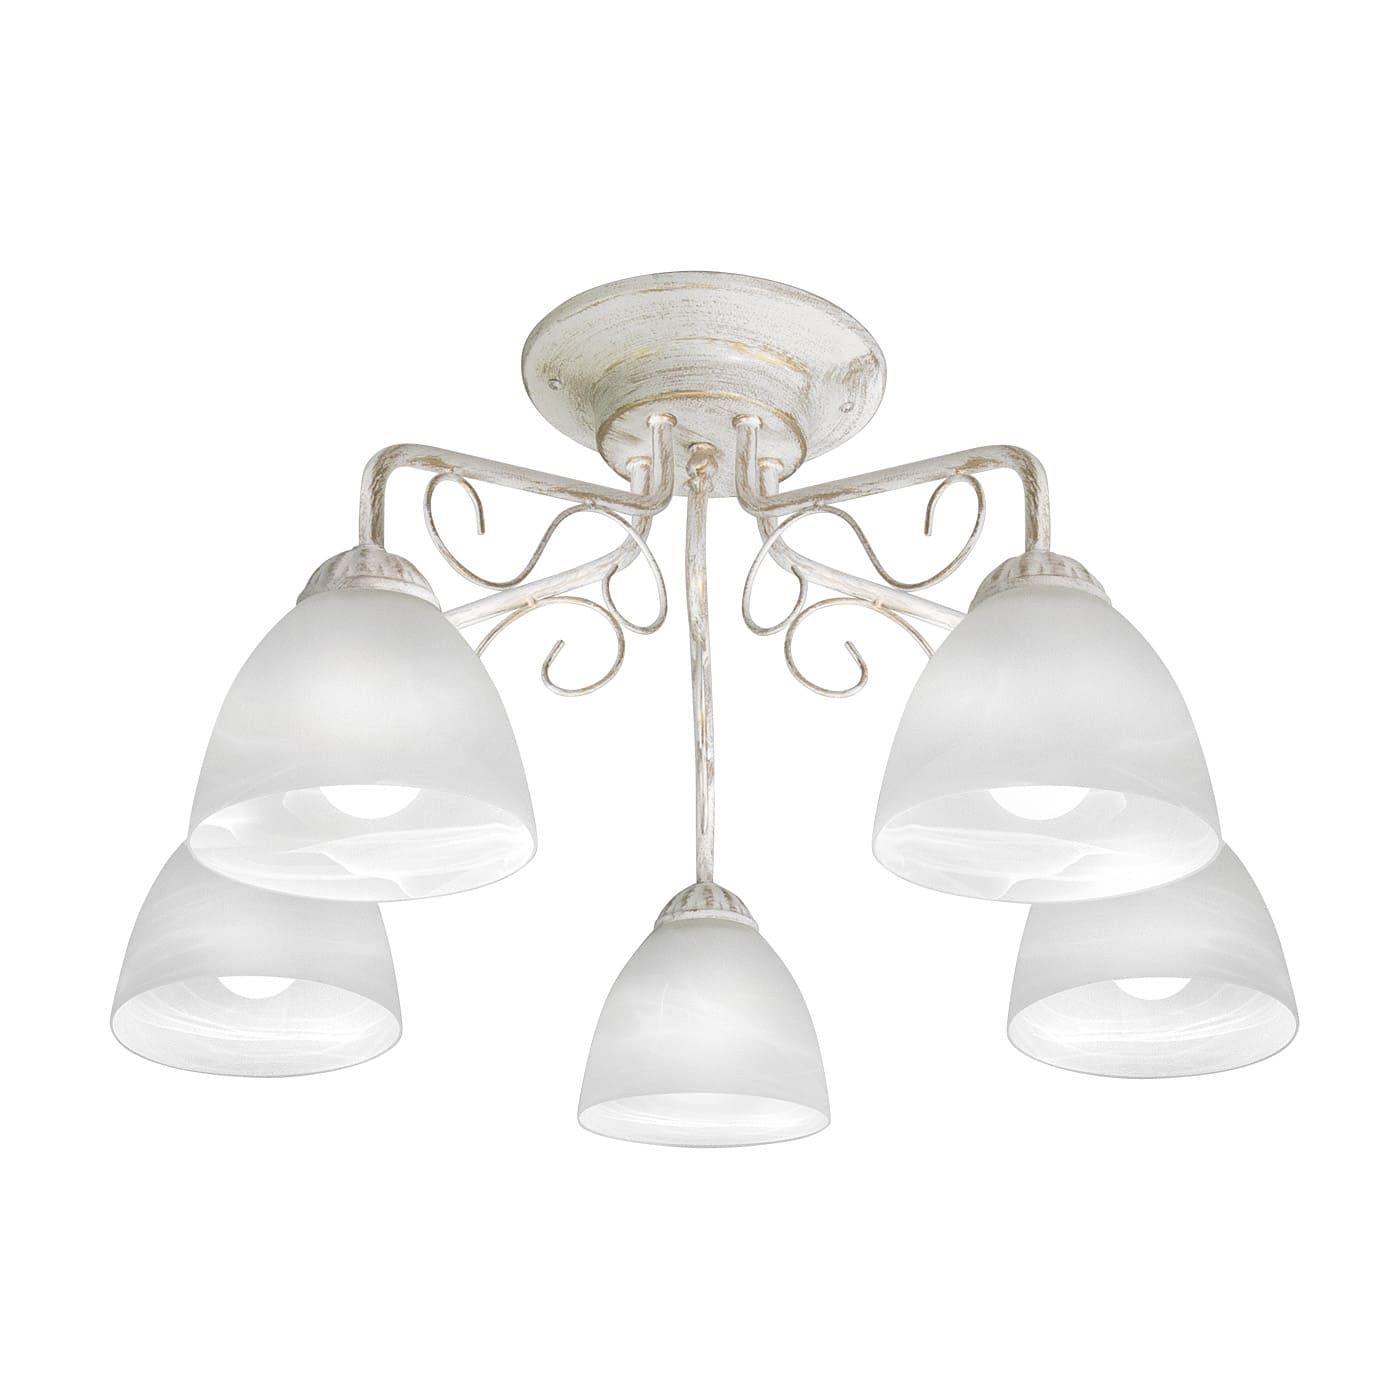 PETRASVET / Ceiling chandelier S2204-5, 5xE27 max. 60W